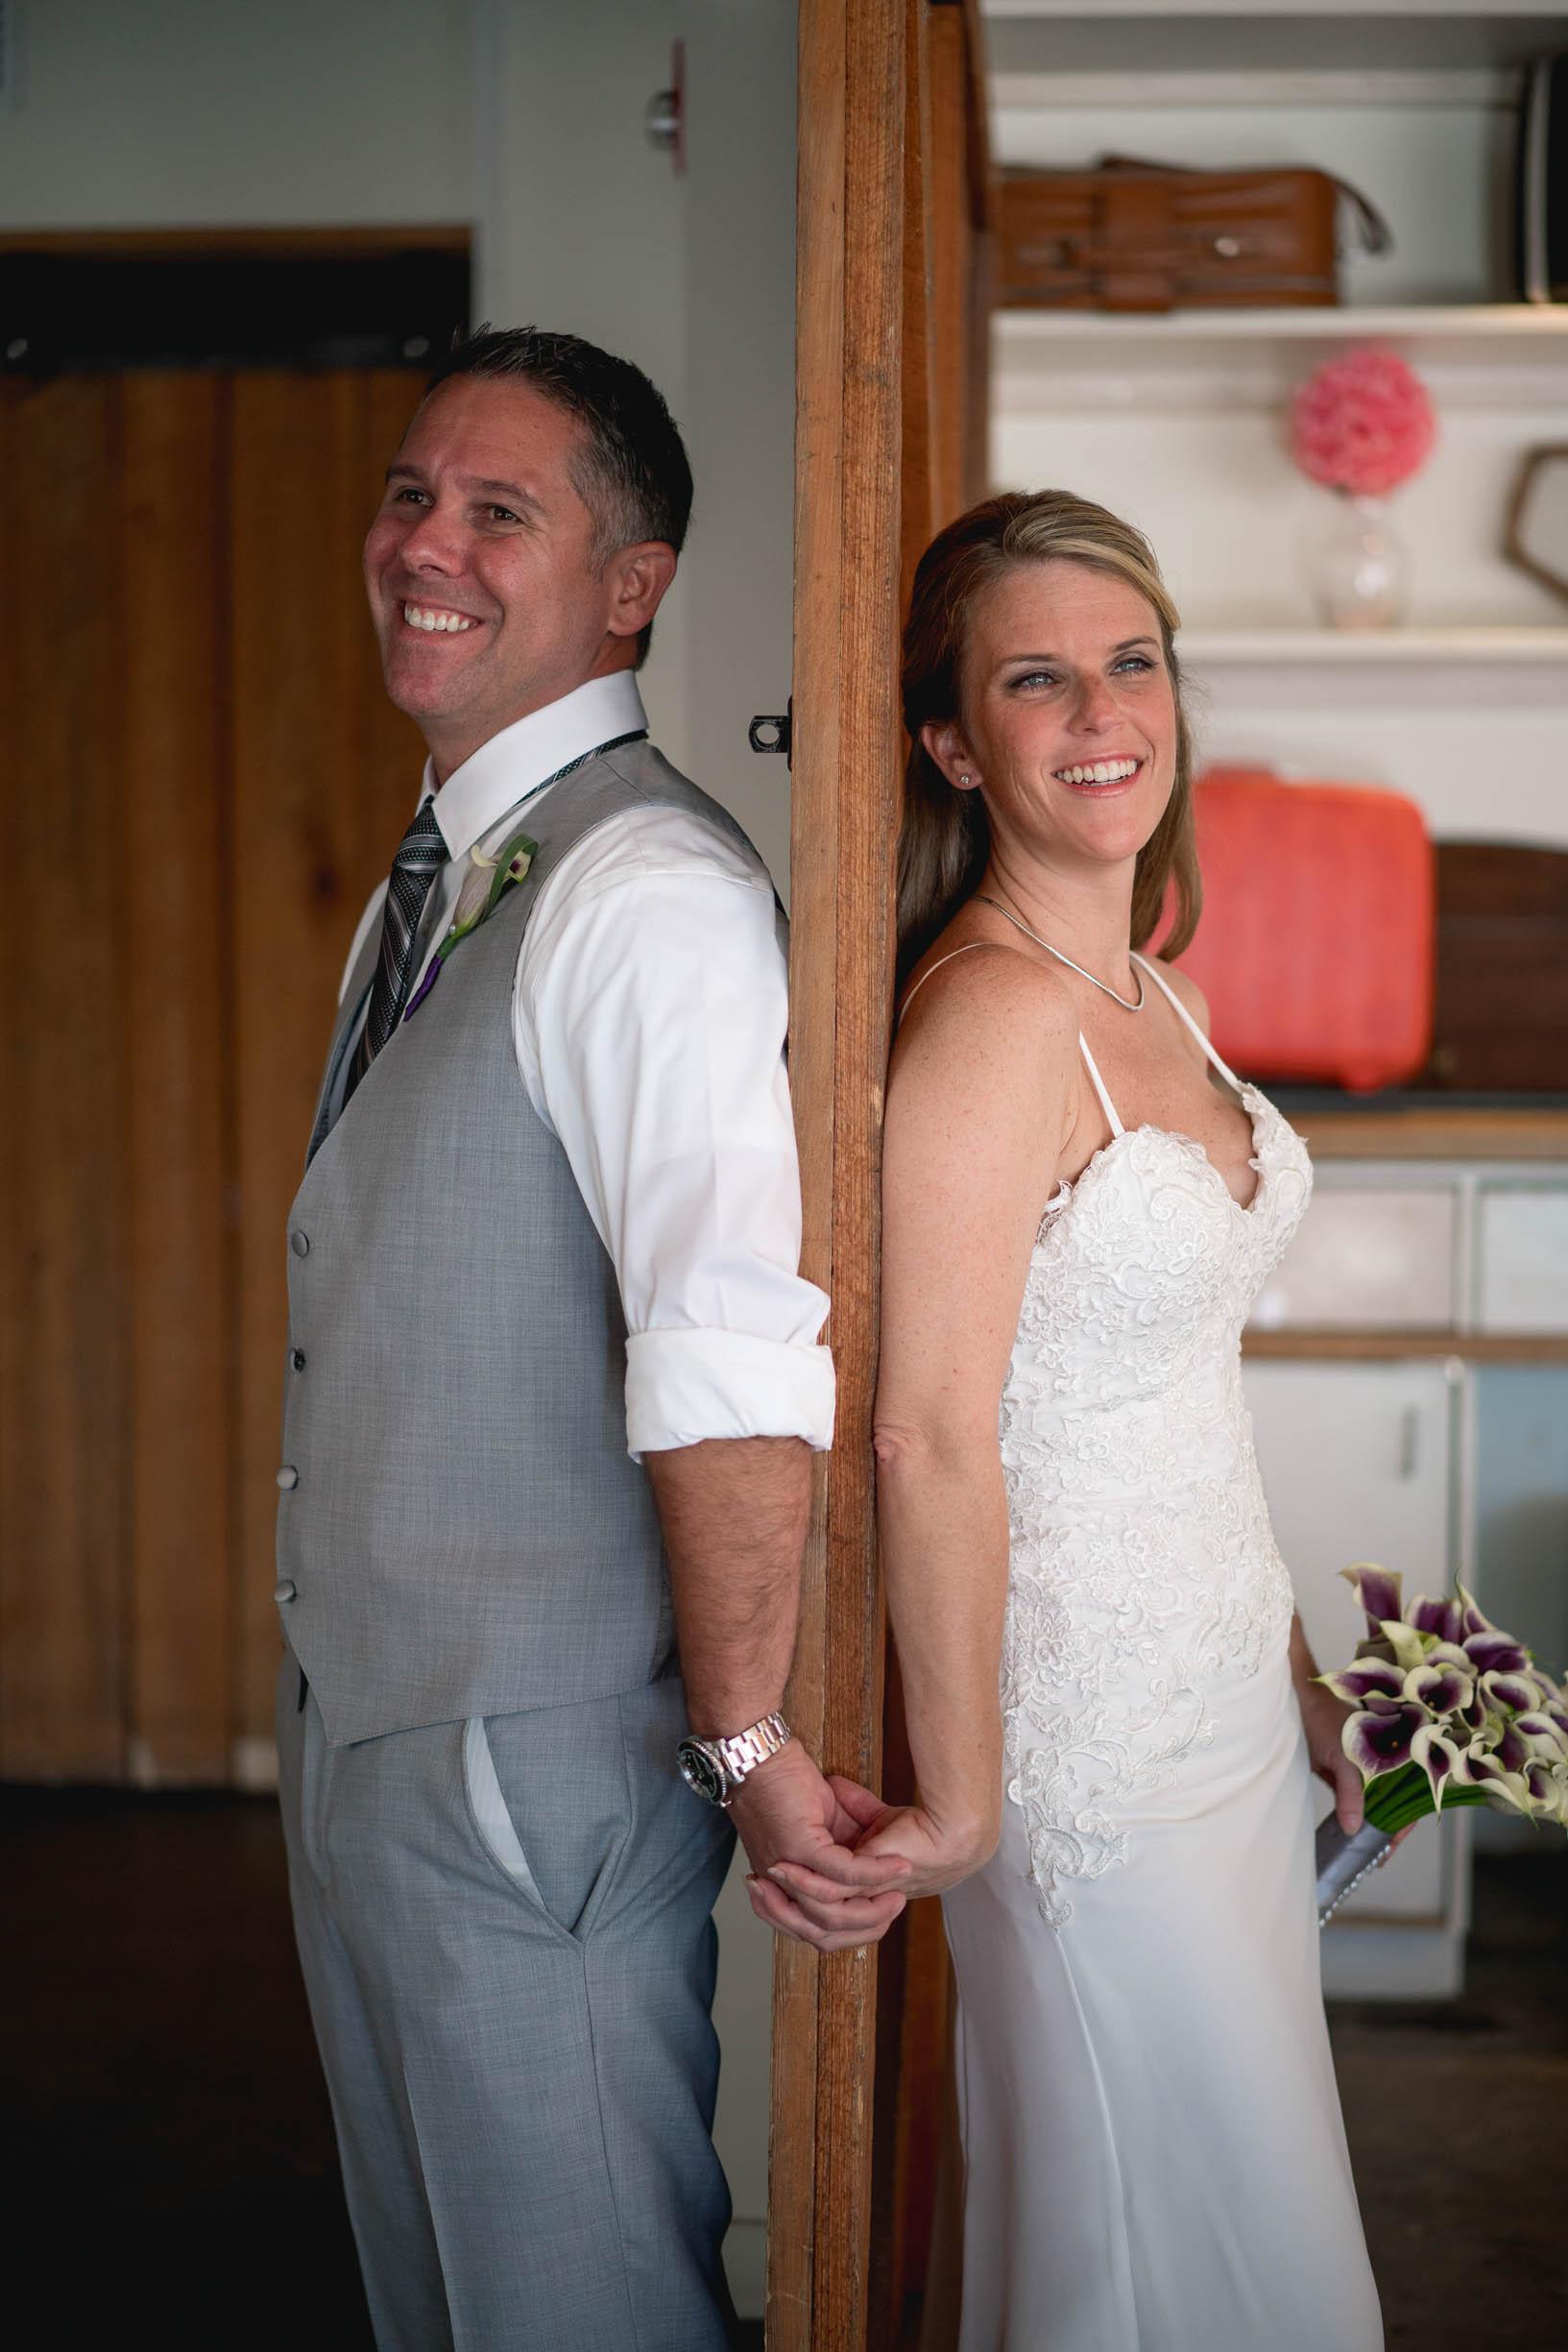 019Portland Wedding Photographer timothy capp.jpg